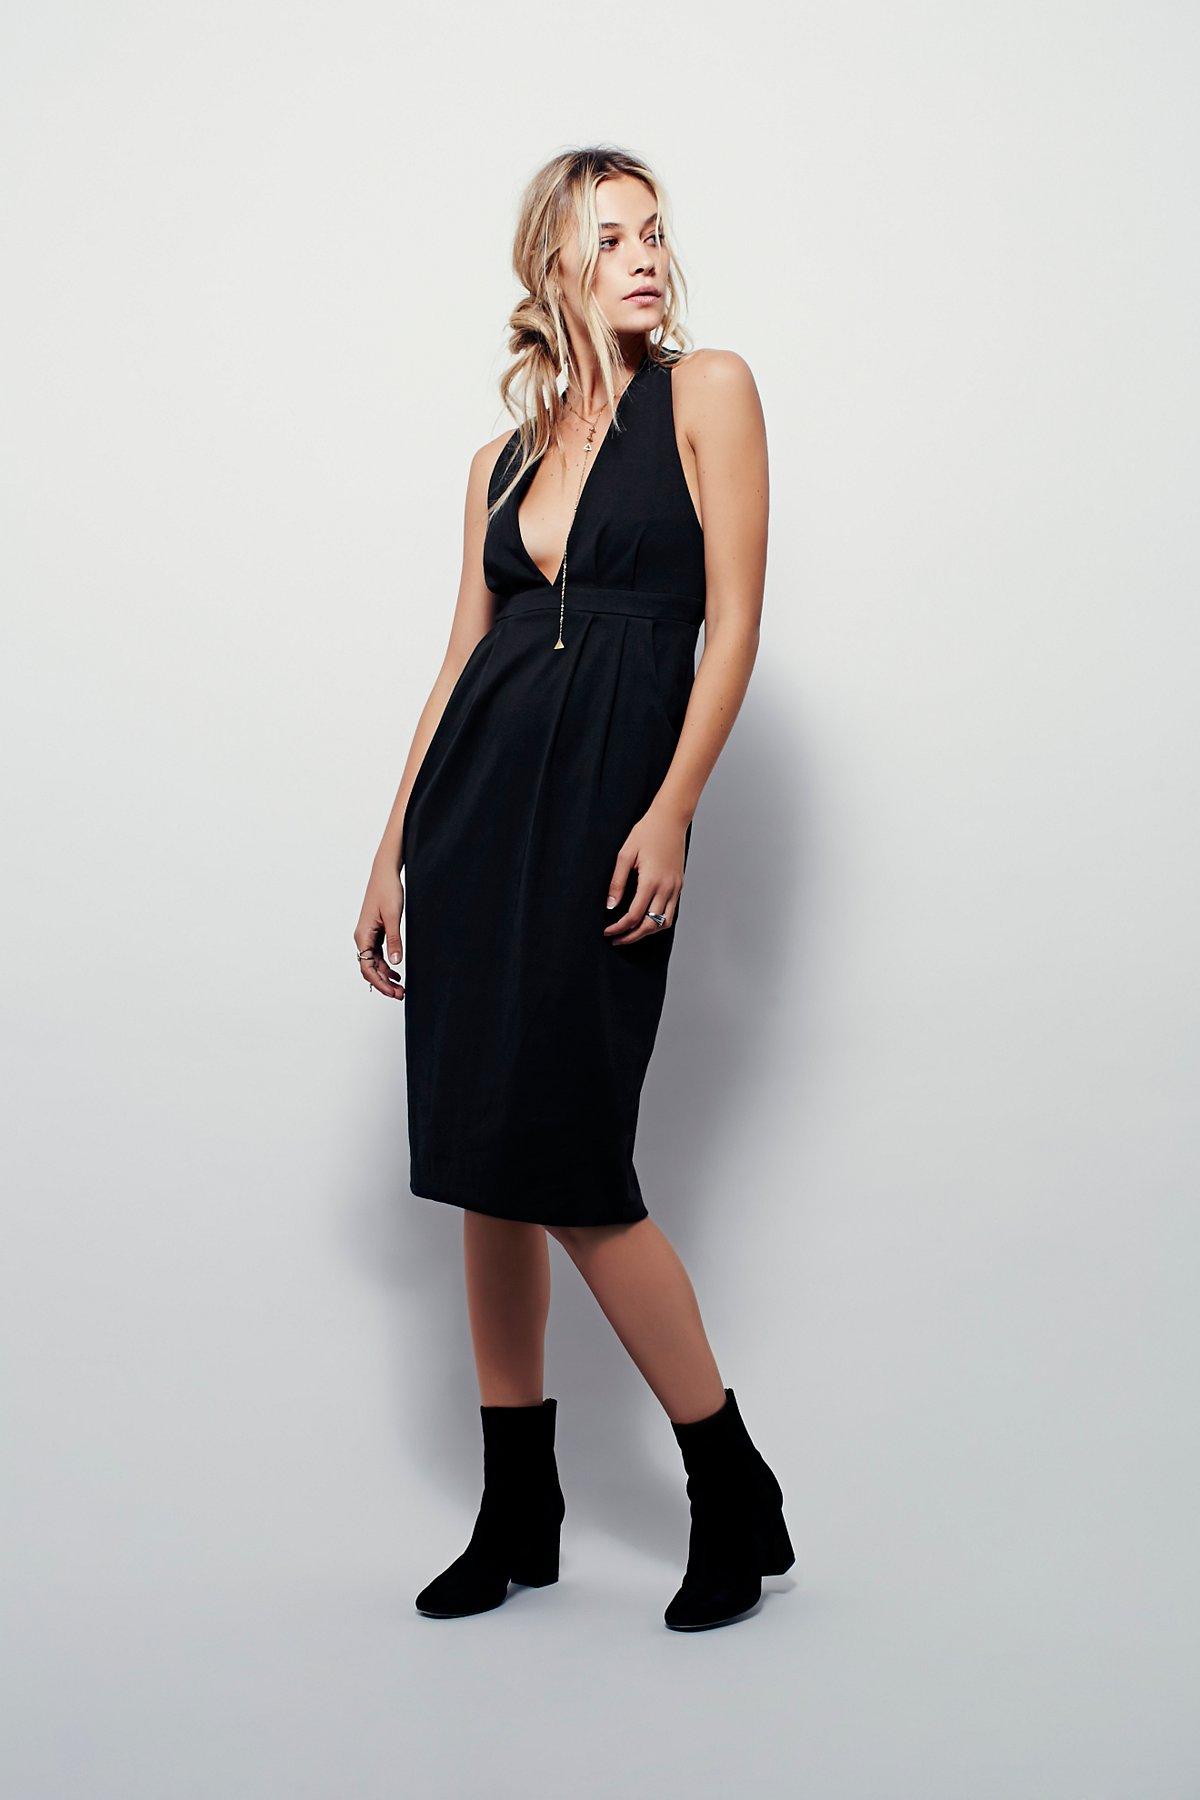 Frenchie针织连衣裙